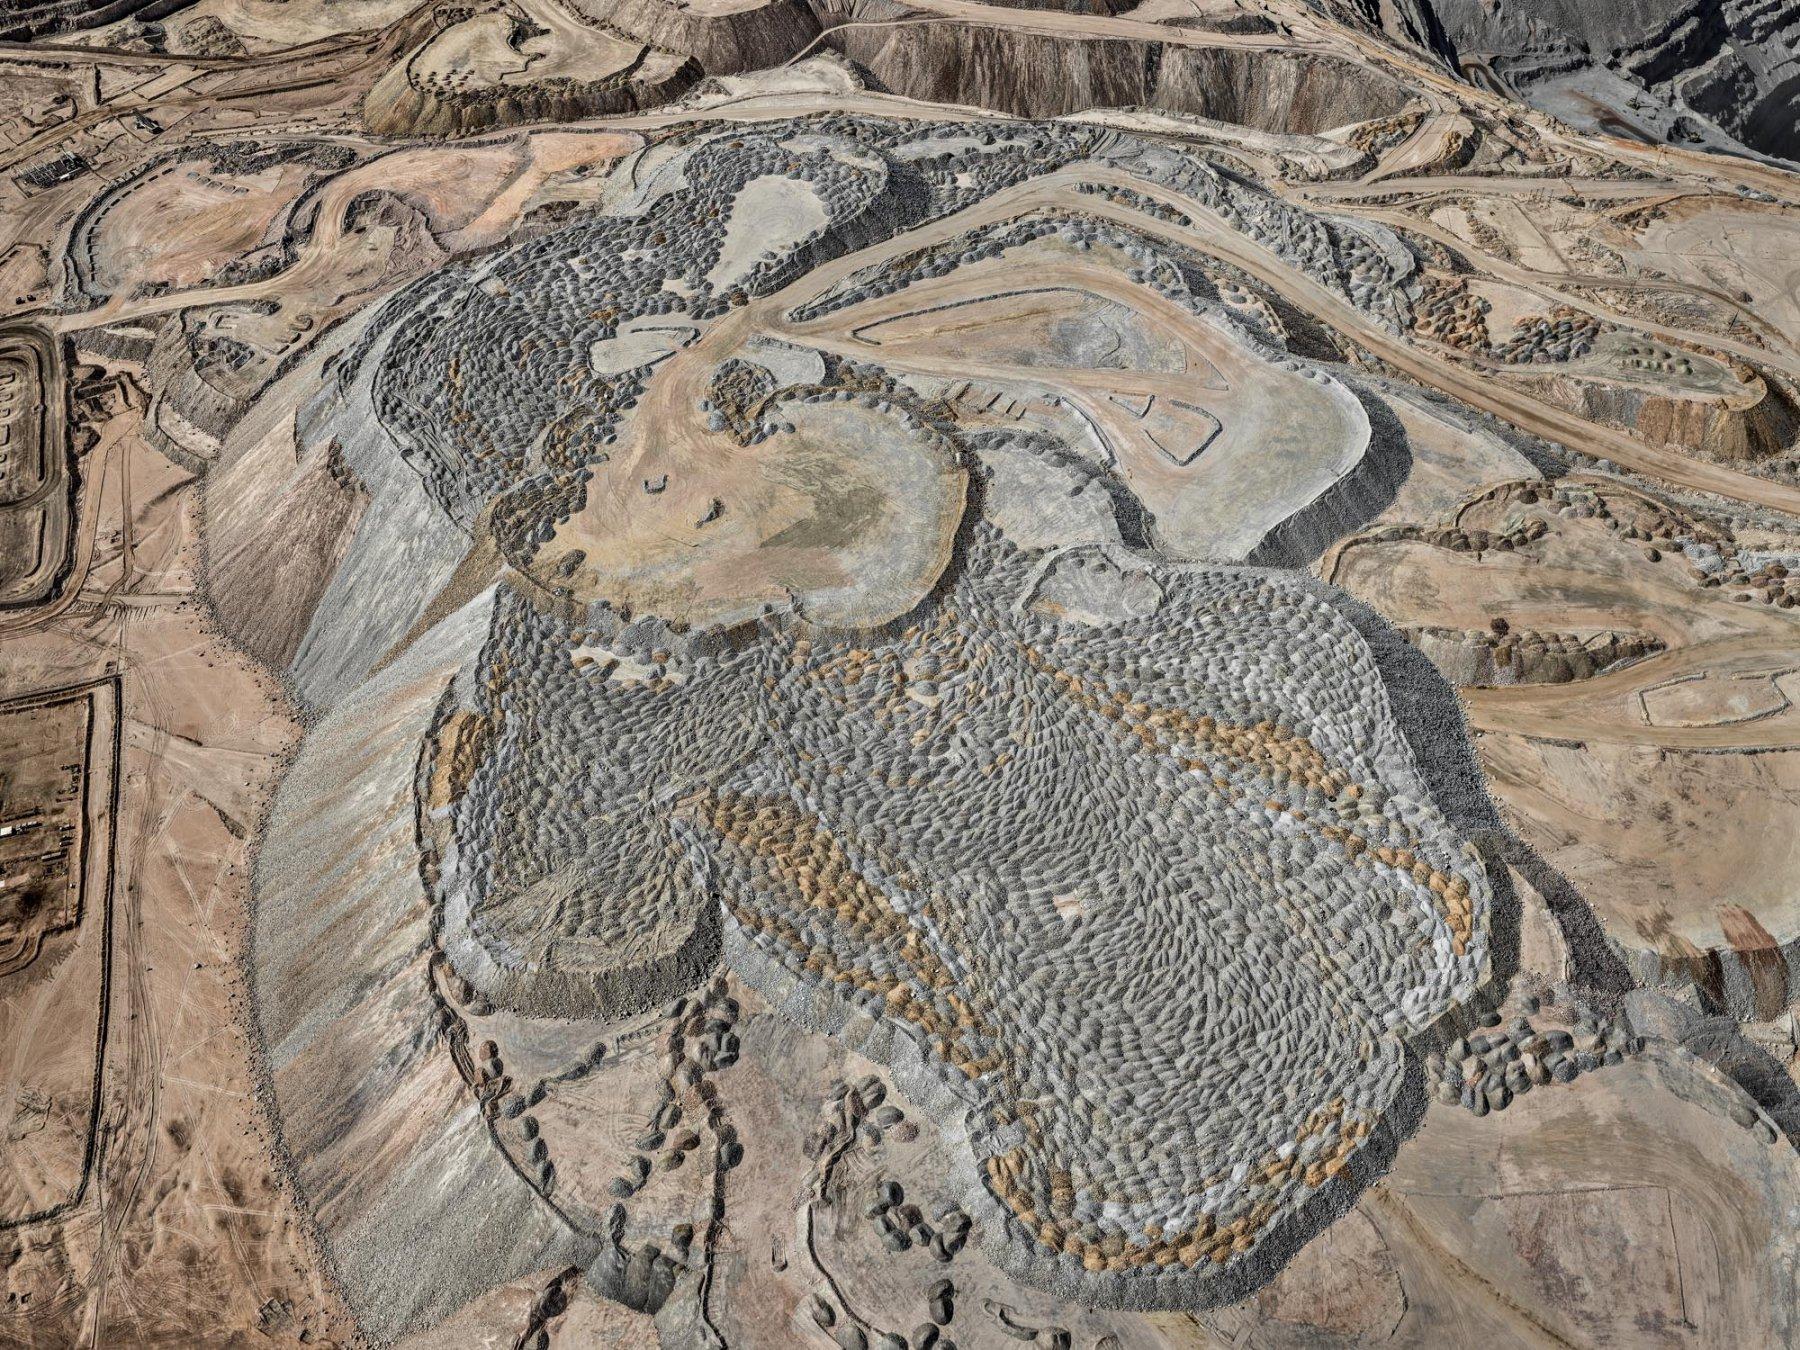 Chuquicamata Copper Mine Overburden #1, Calama, Chile